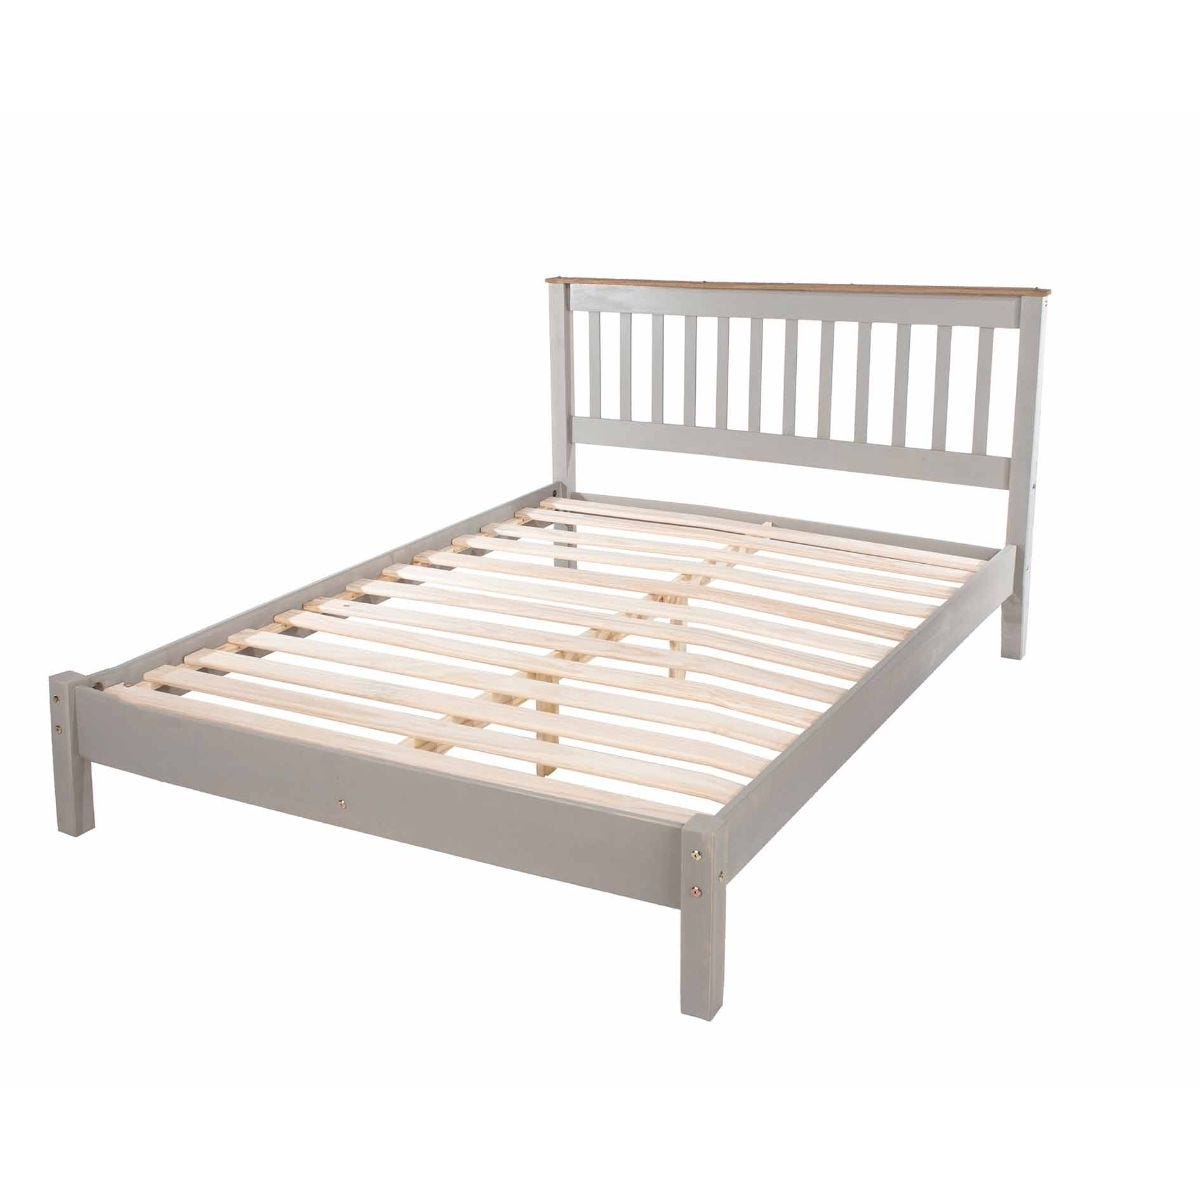 Corona Grey Wooden Slatted Double Bed Frame 4ft 6, Grey